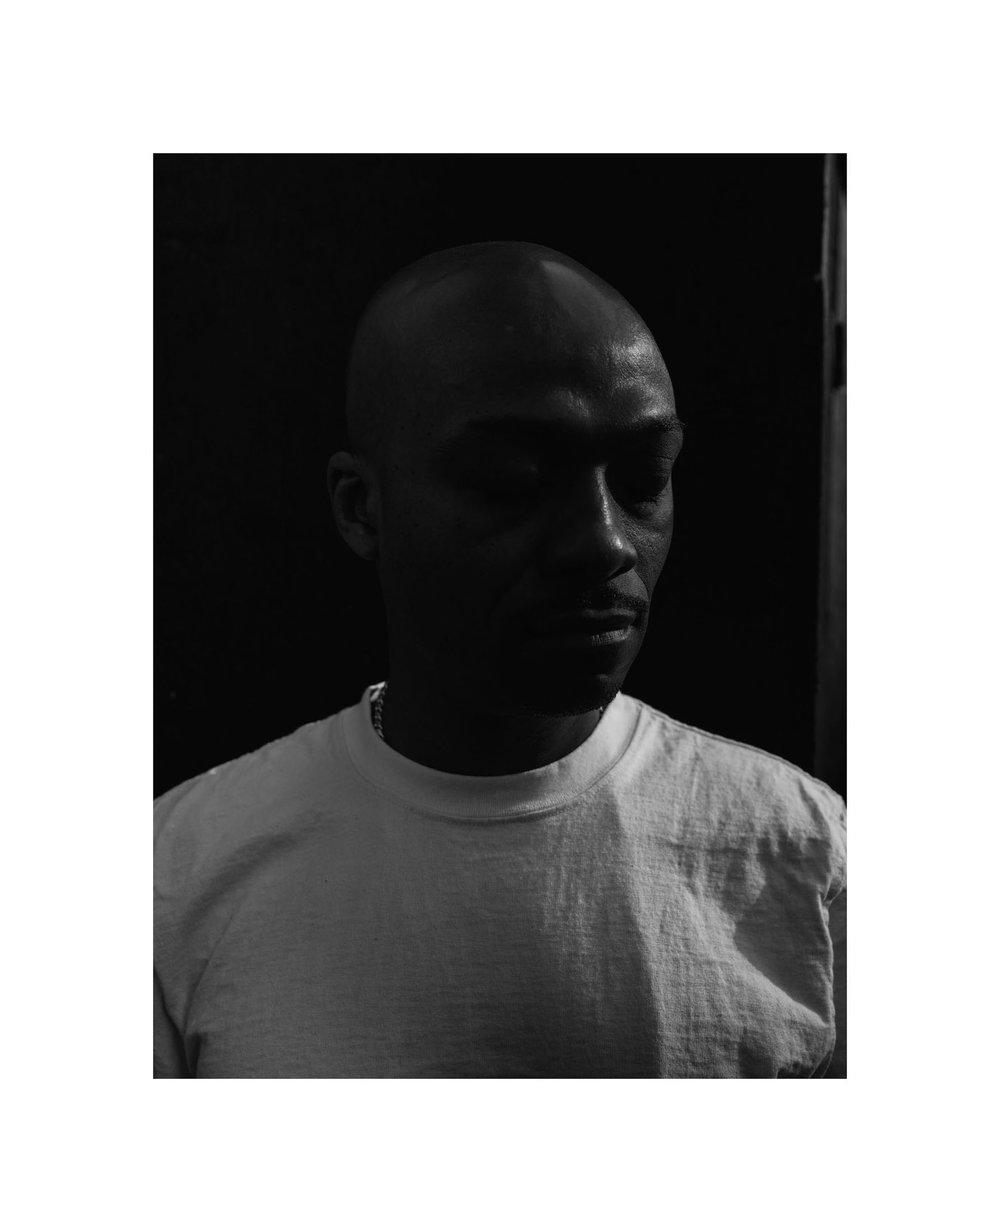 Portrait - RBMA - 08.jpg